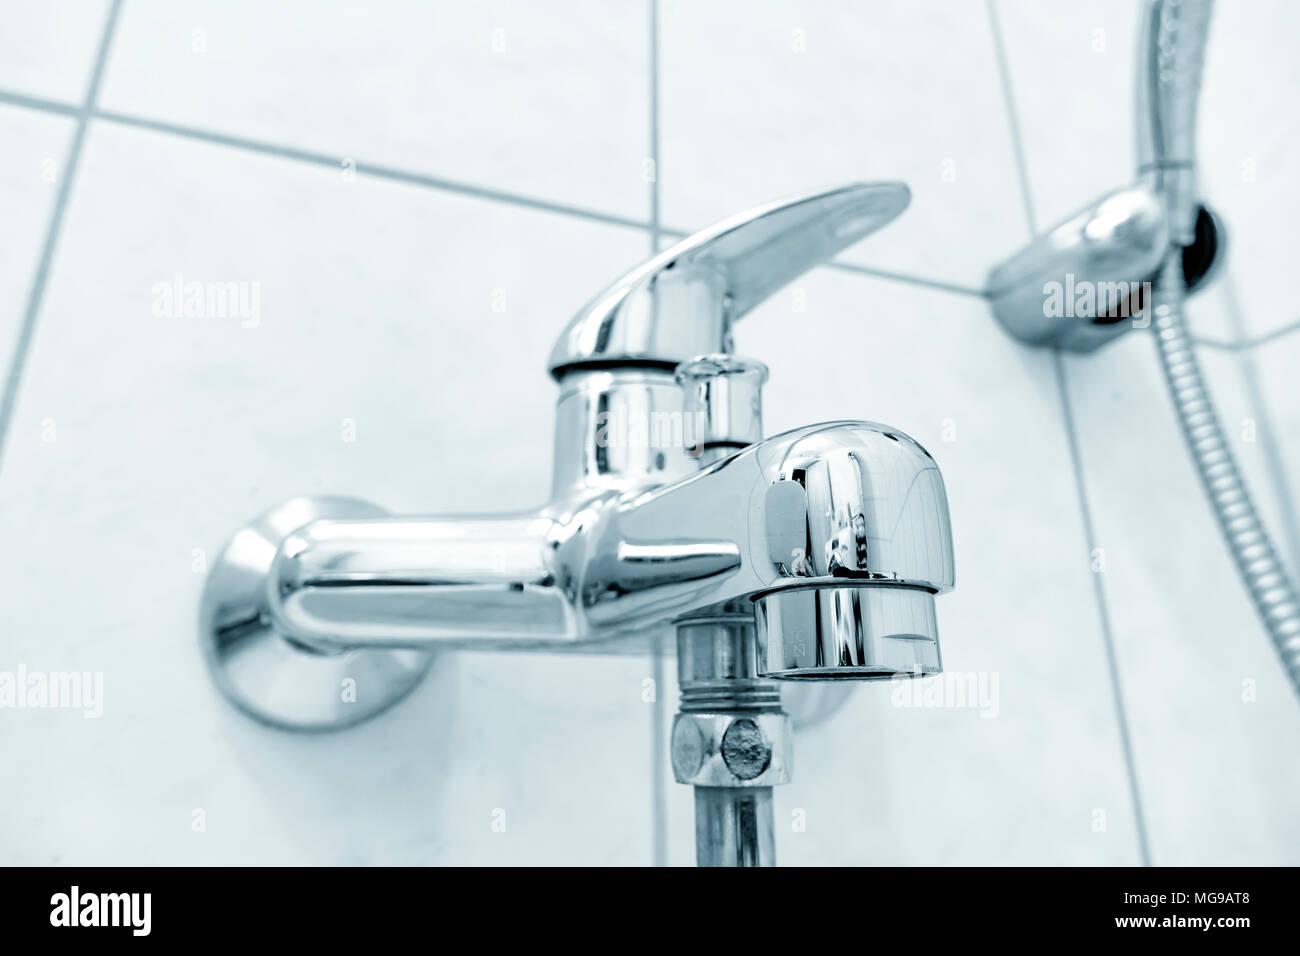 Bath Tap Stock Photos & Bath Tap Stock Images - Alamy